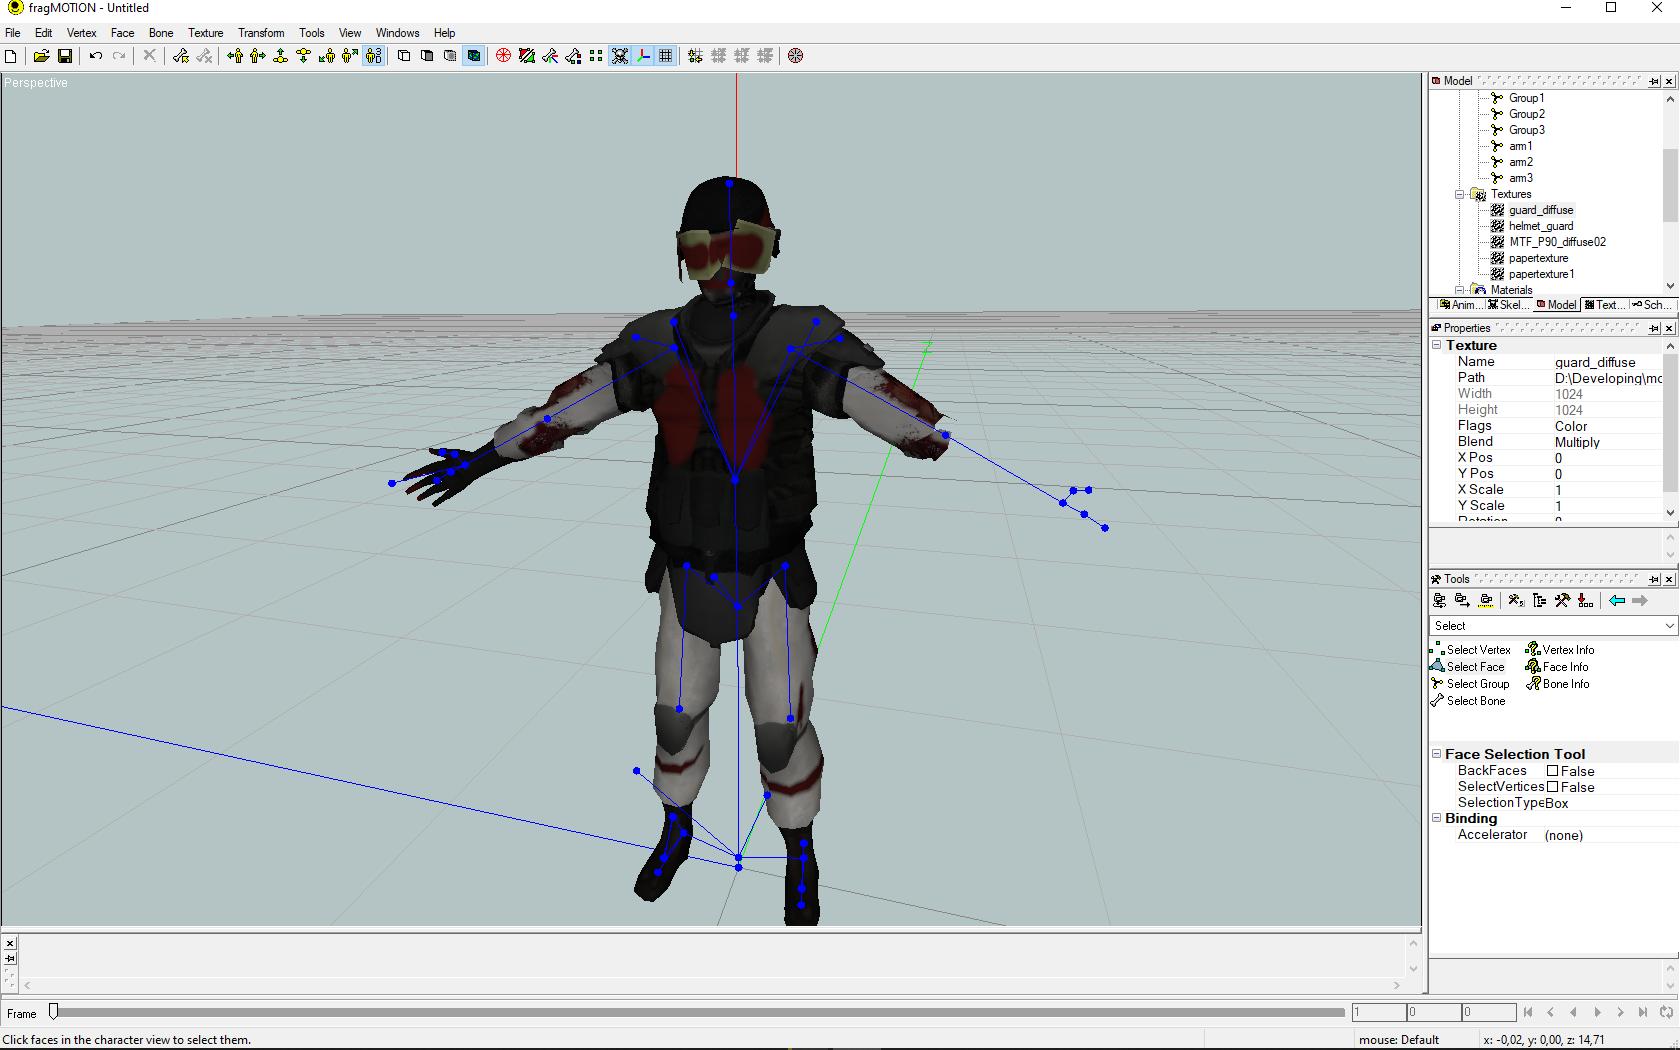 New Corpse(Guard Model), he have massive bloodloss and broken visor of his helmet